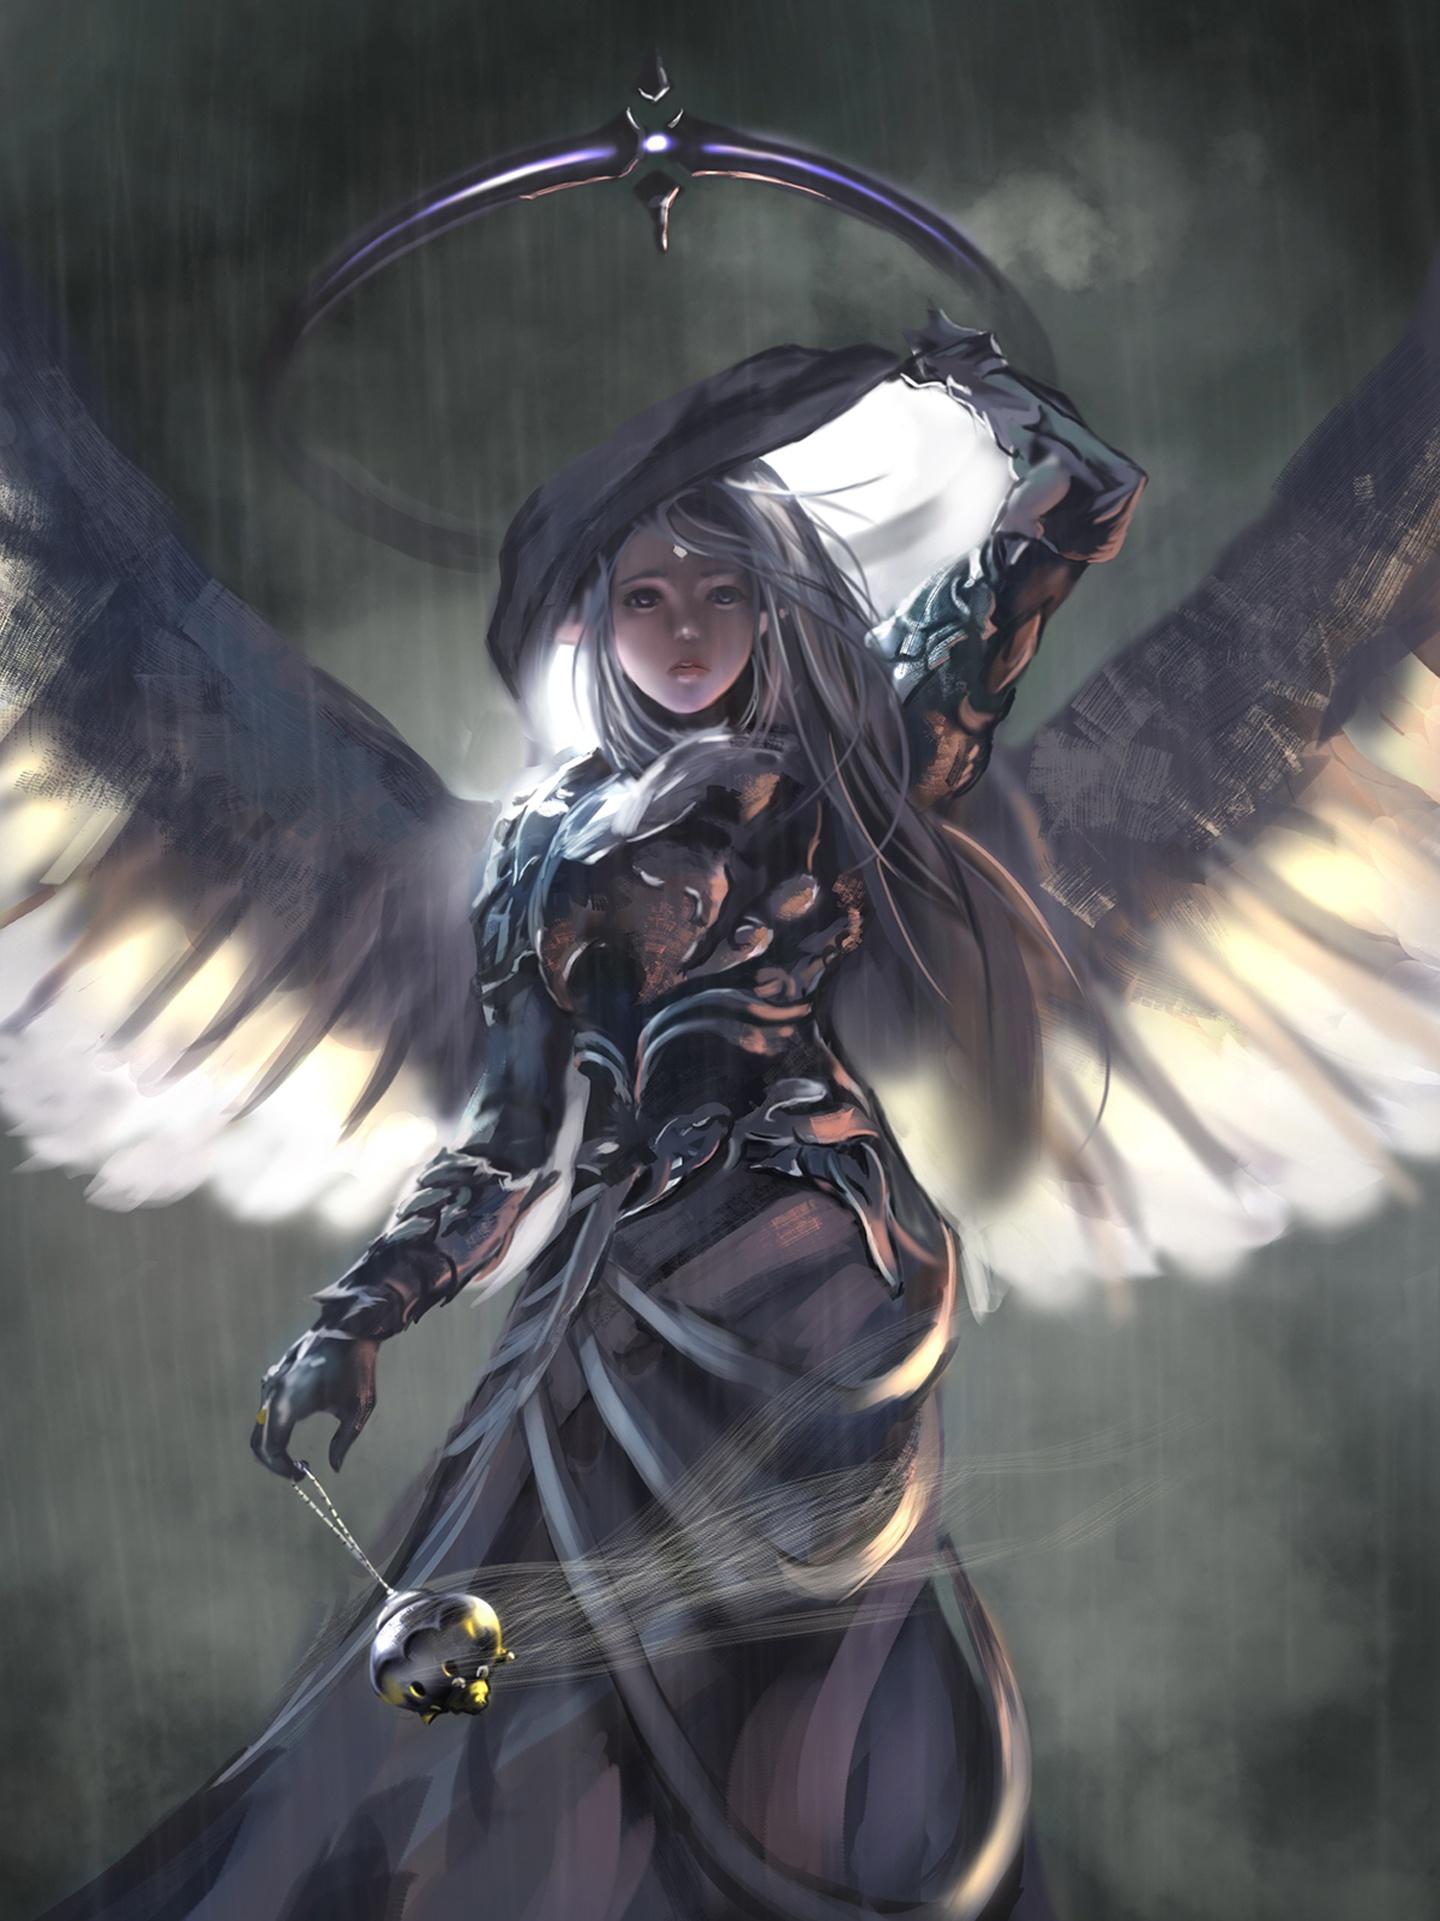 Image Of Beautiful Girl Wallpaper Wings Angel Wlop Oiginal Girl Woman Beautiful Fantasy Art